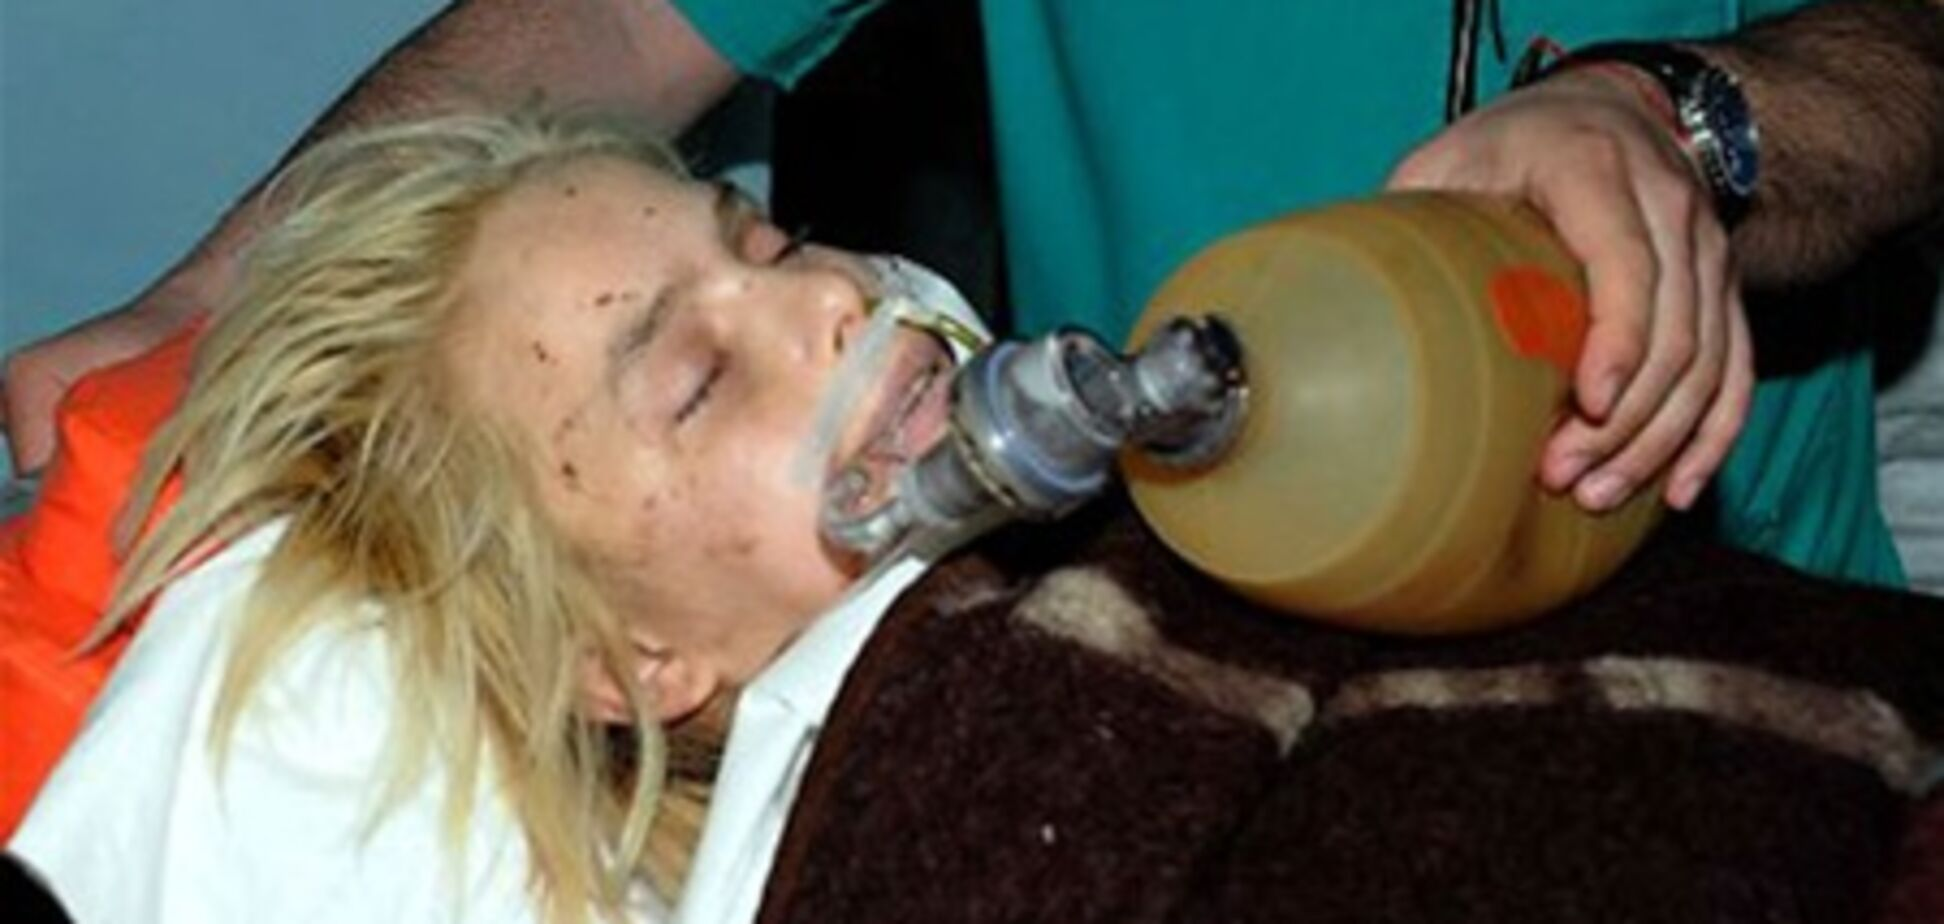 Оксане Макар угрожает сепсис - медики